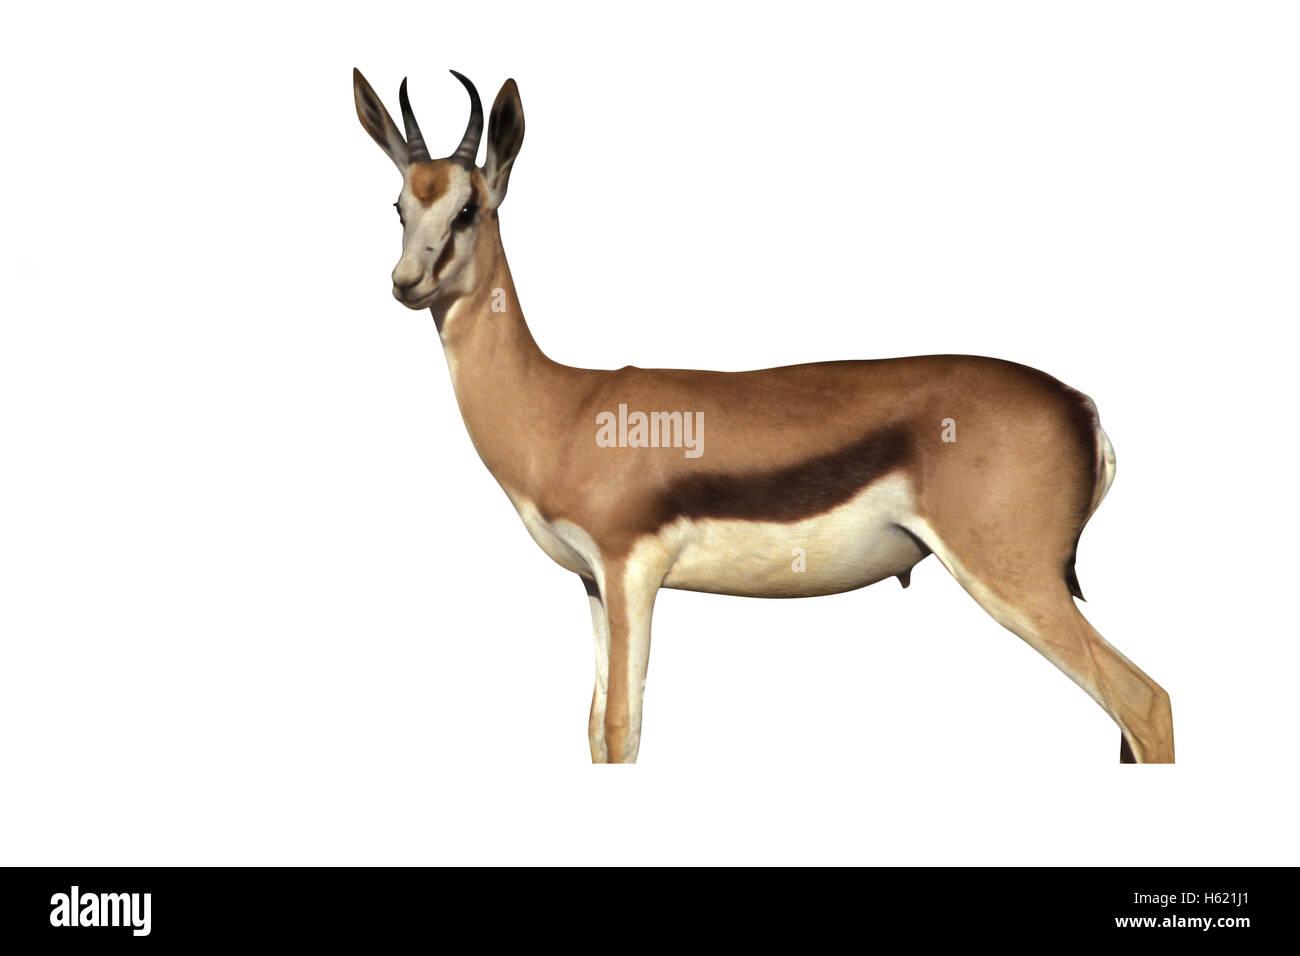 Springbuck or Springbok,  Antidorcas marsupialis, single mammal, Namibia - Stock Image